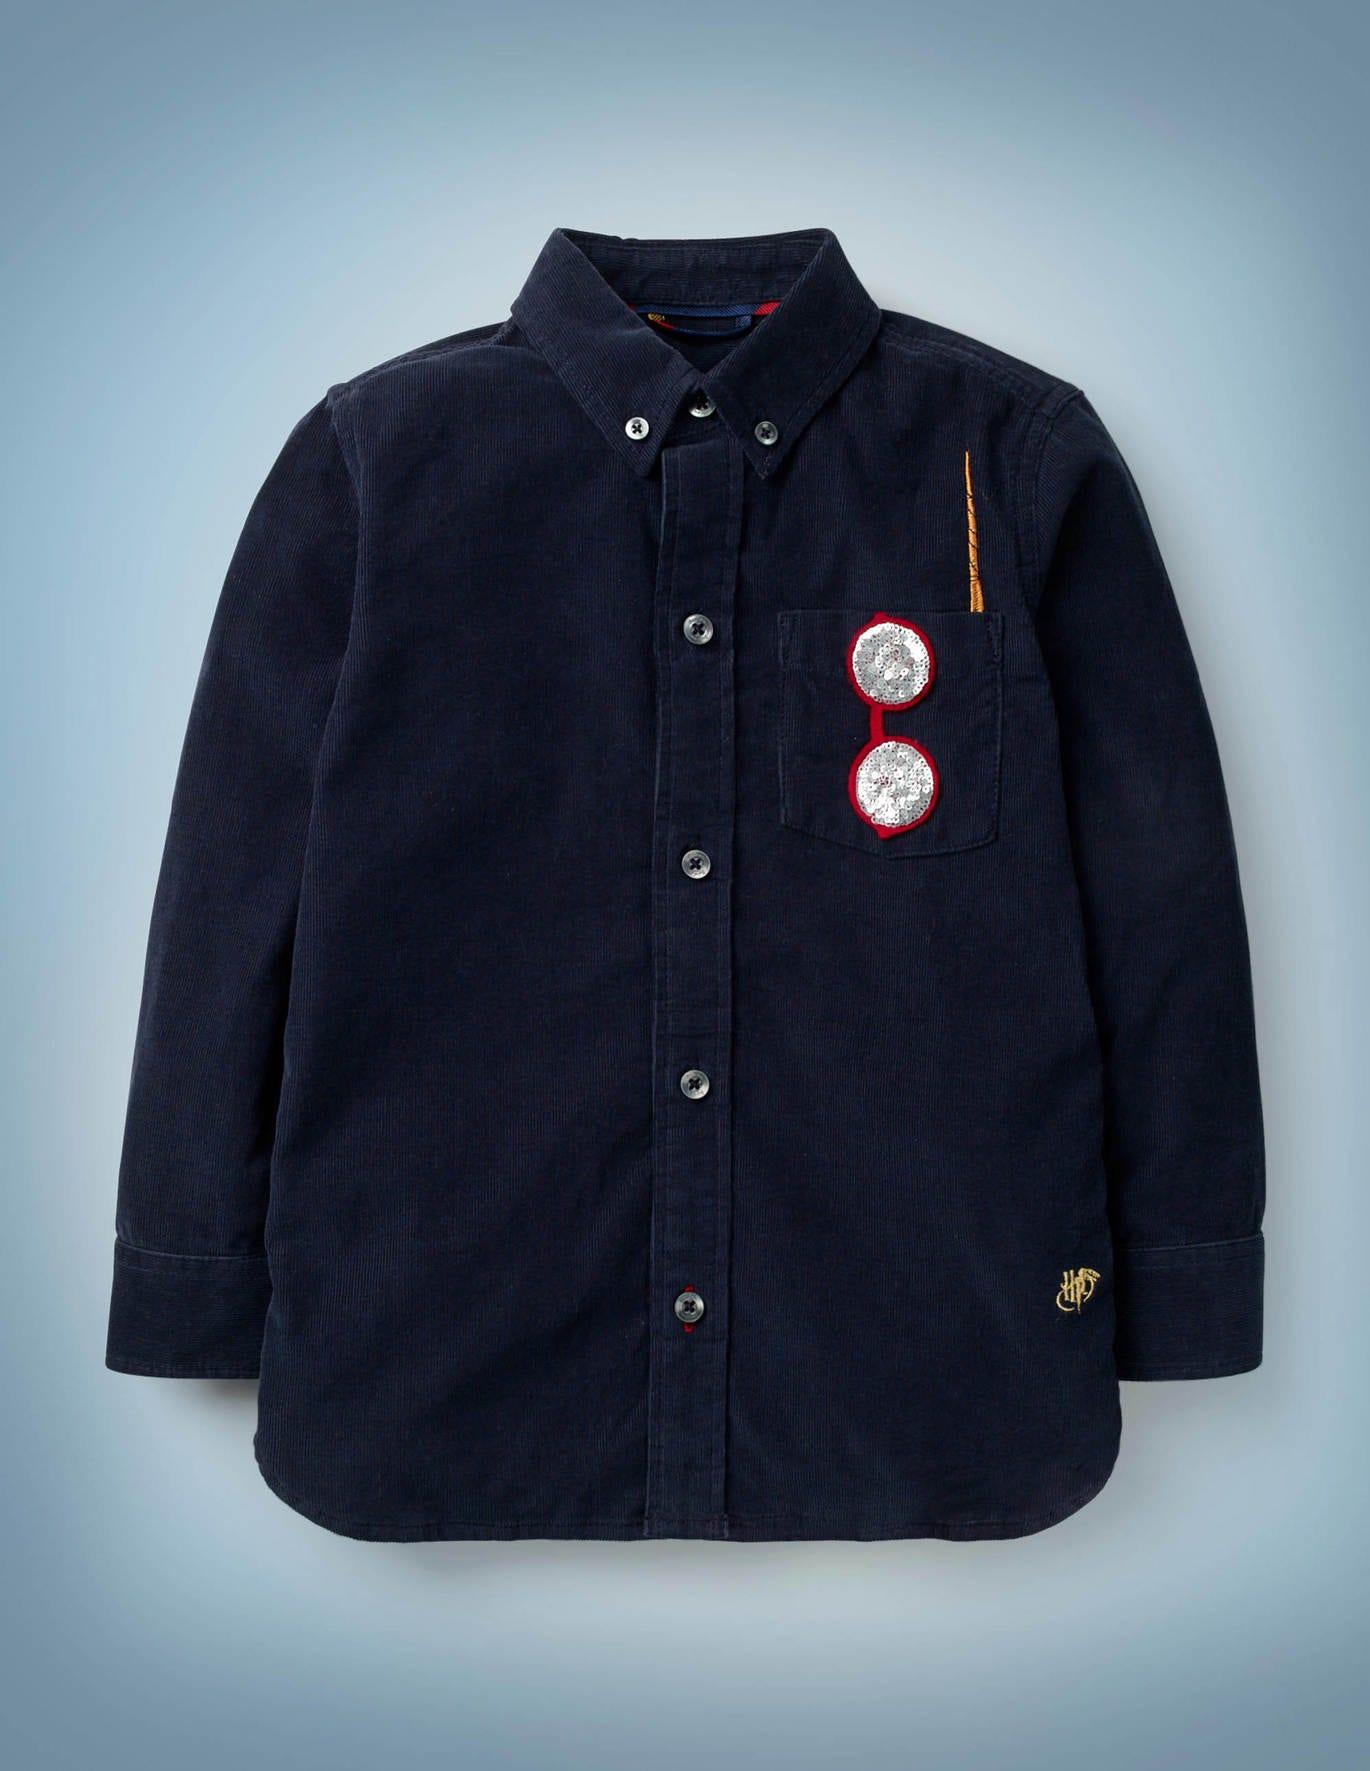 Harry Pocket Cord Shirt - Midnight Blue